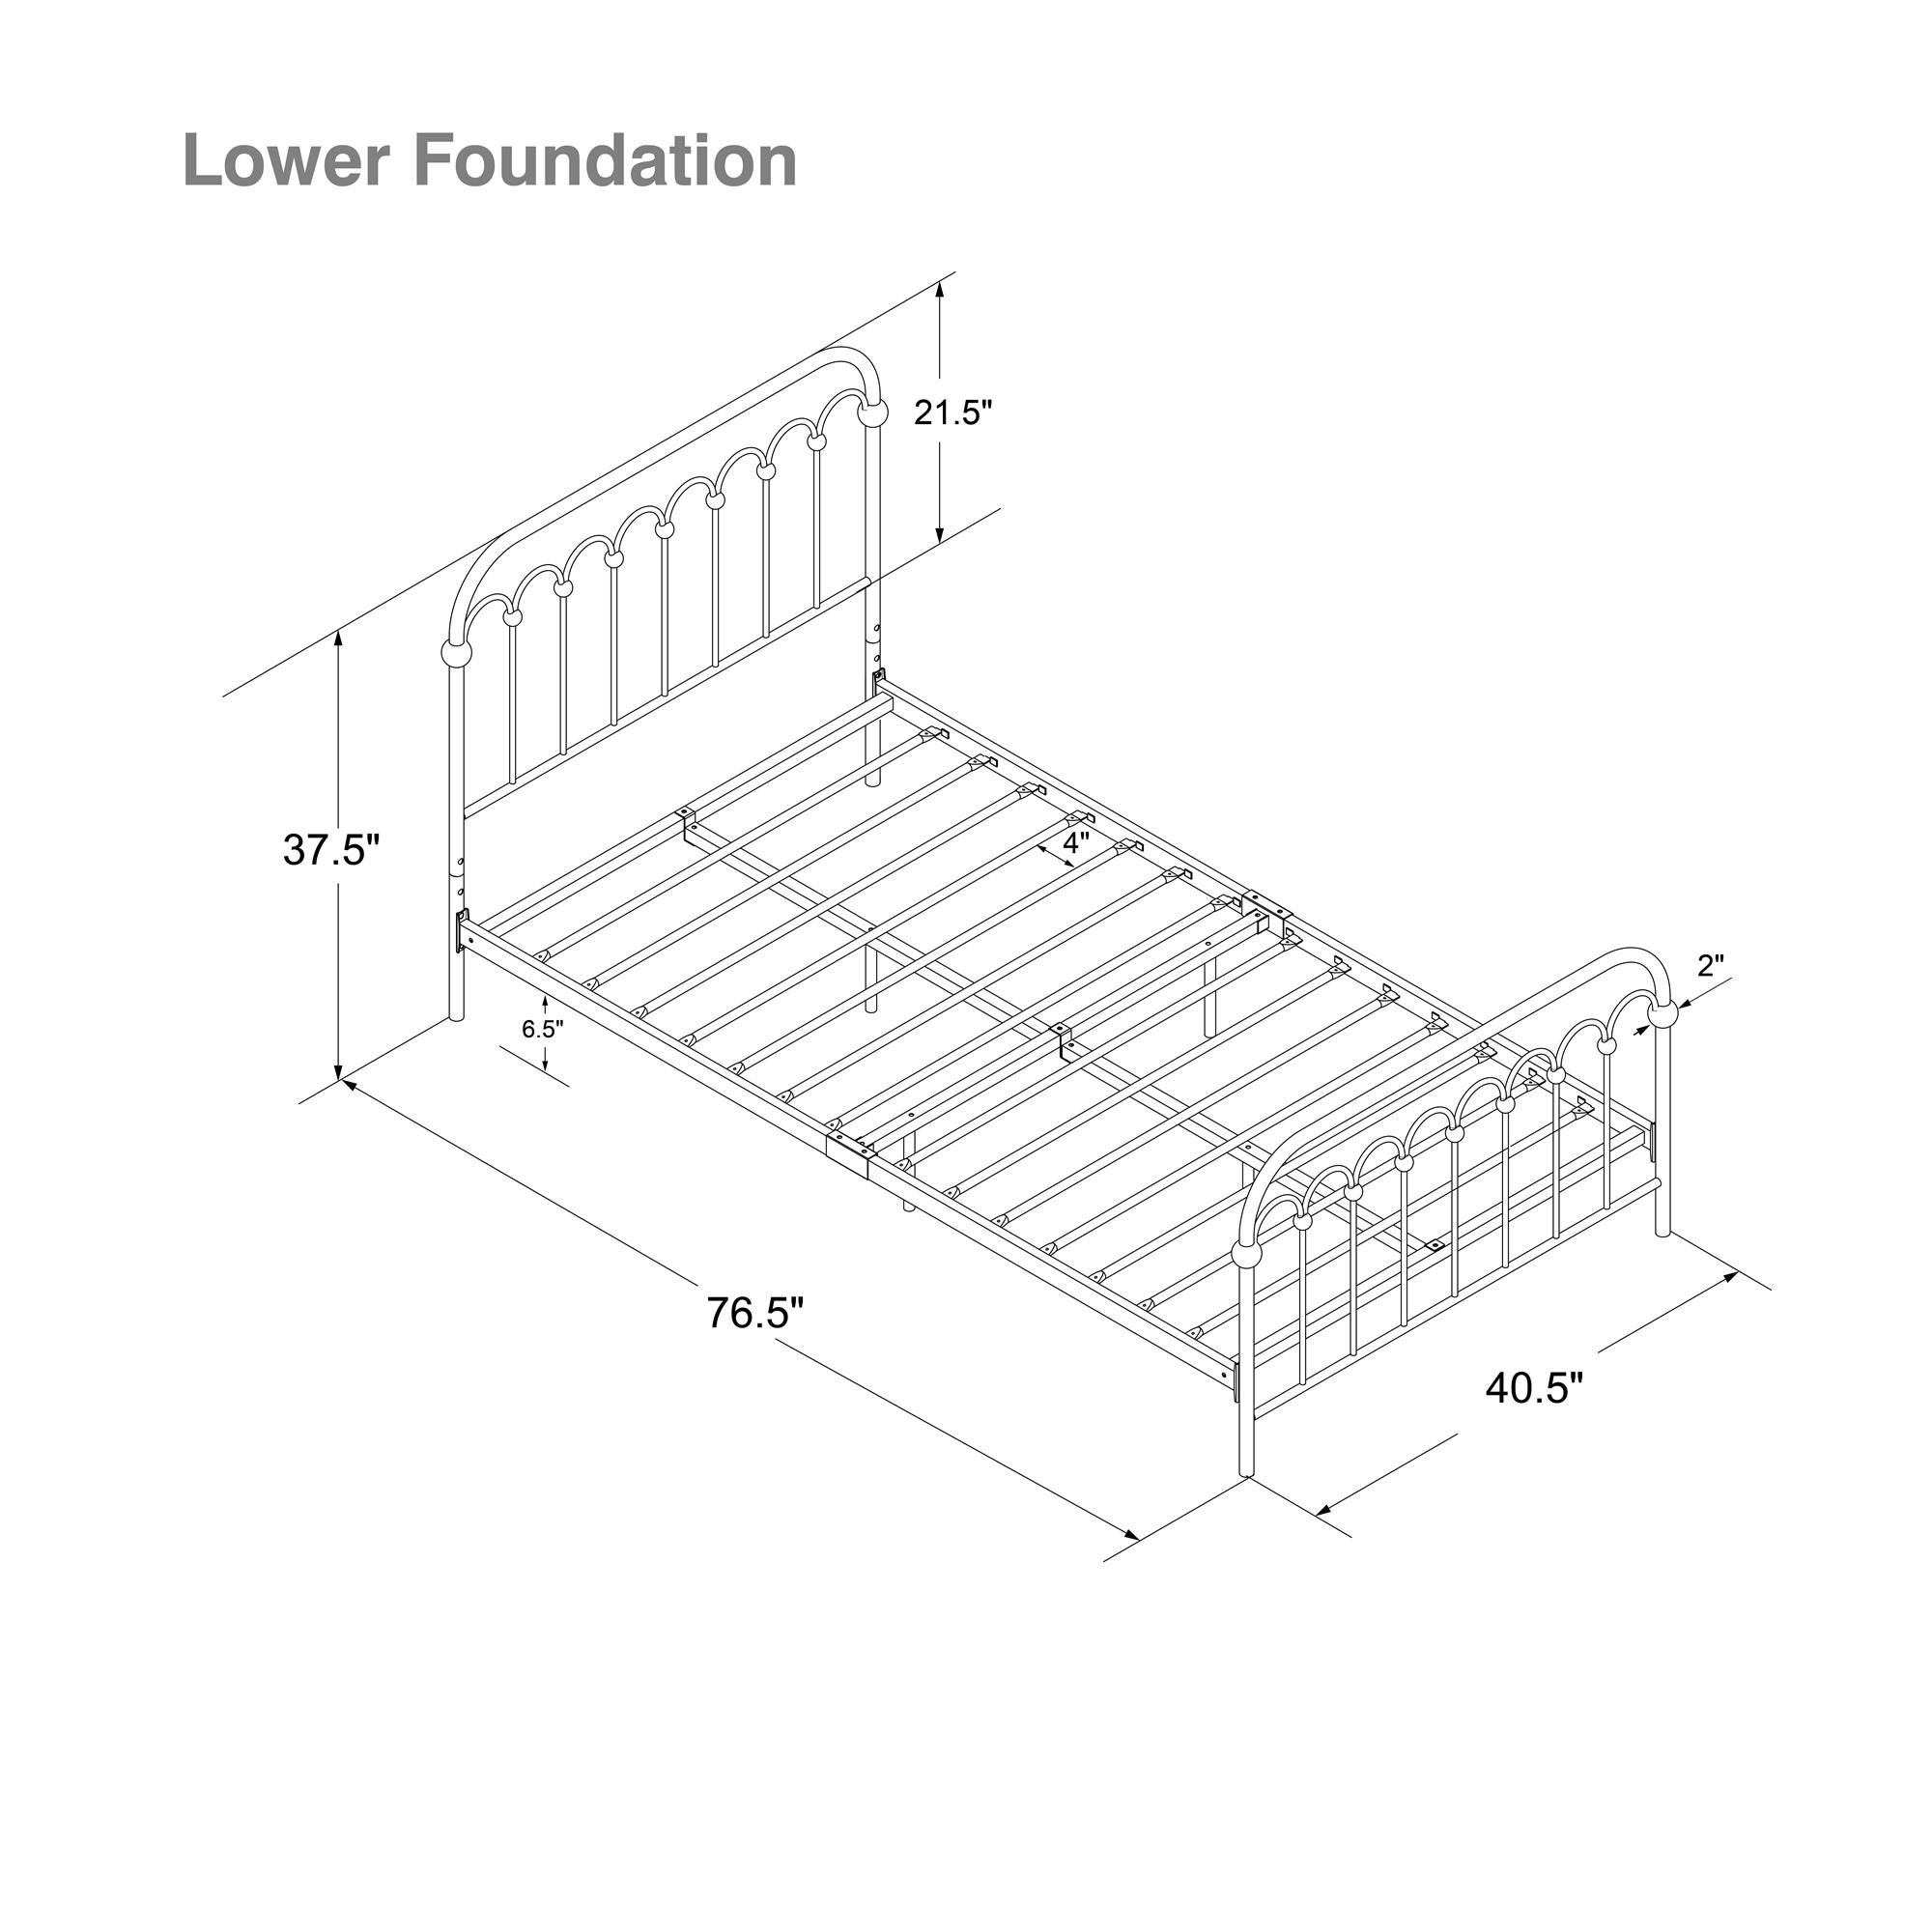 Novogratz Bright Pop Metal Bed, Adjustable Height for Underbed Storage (6.5'' or 11''), Metal Slats Included, Twin, Turquoise